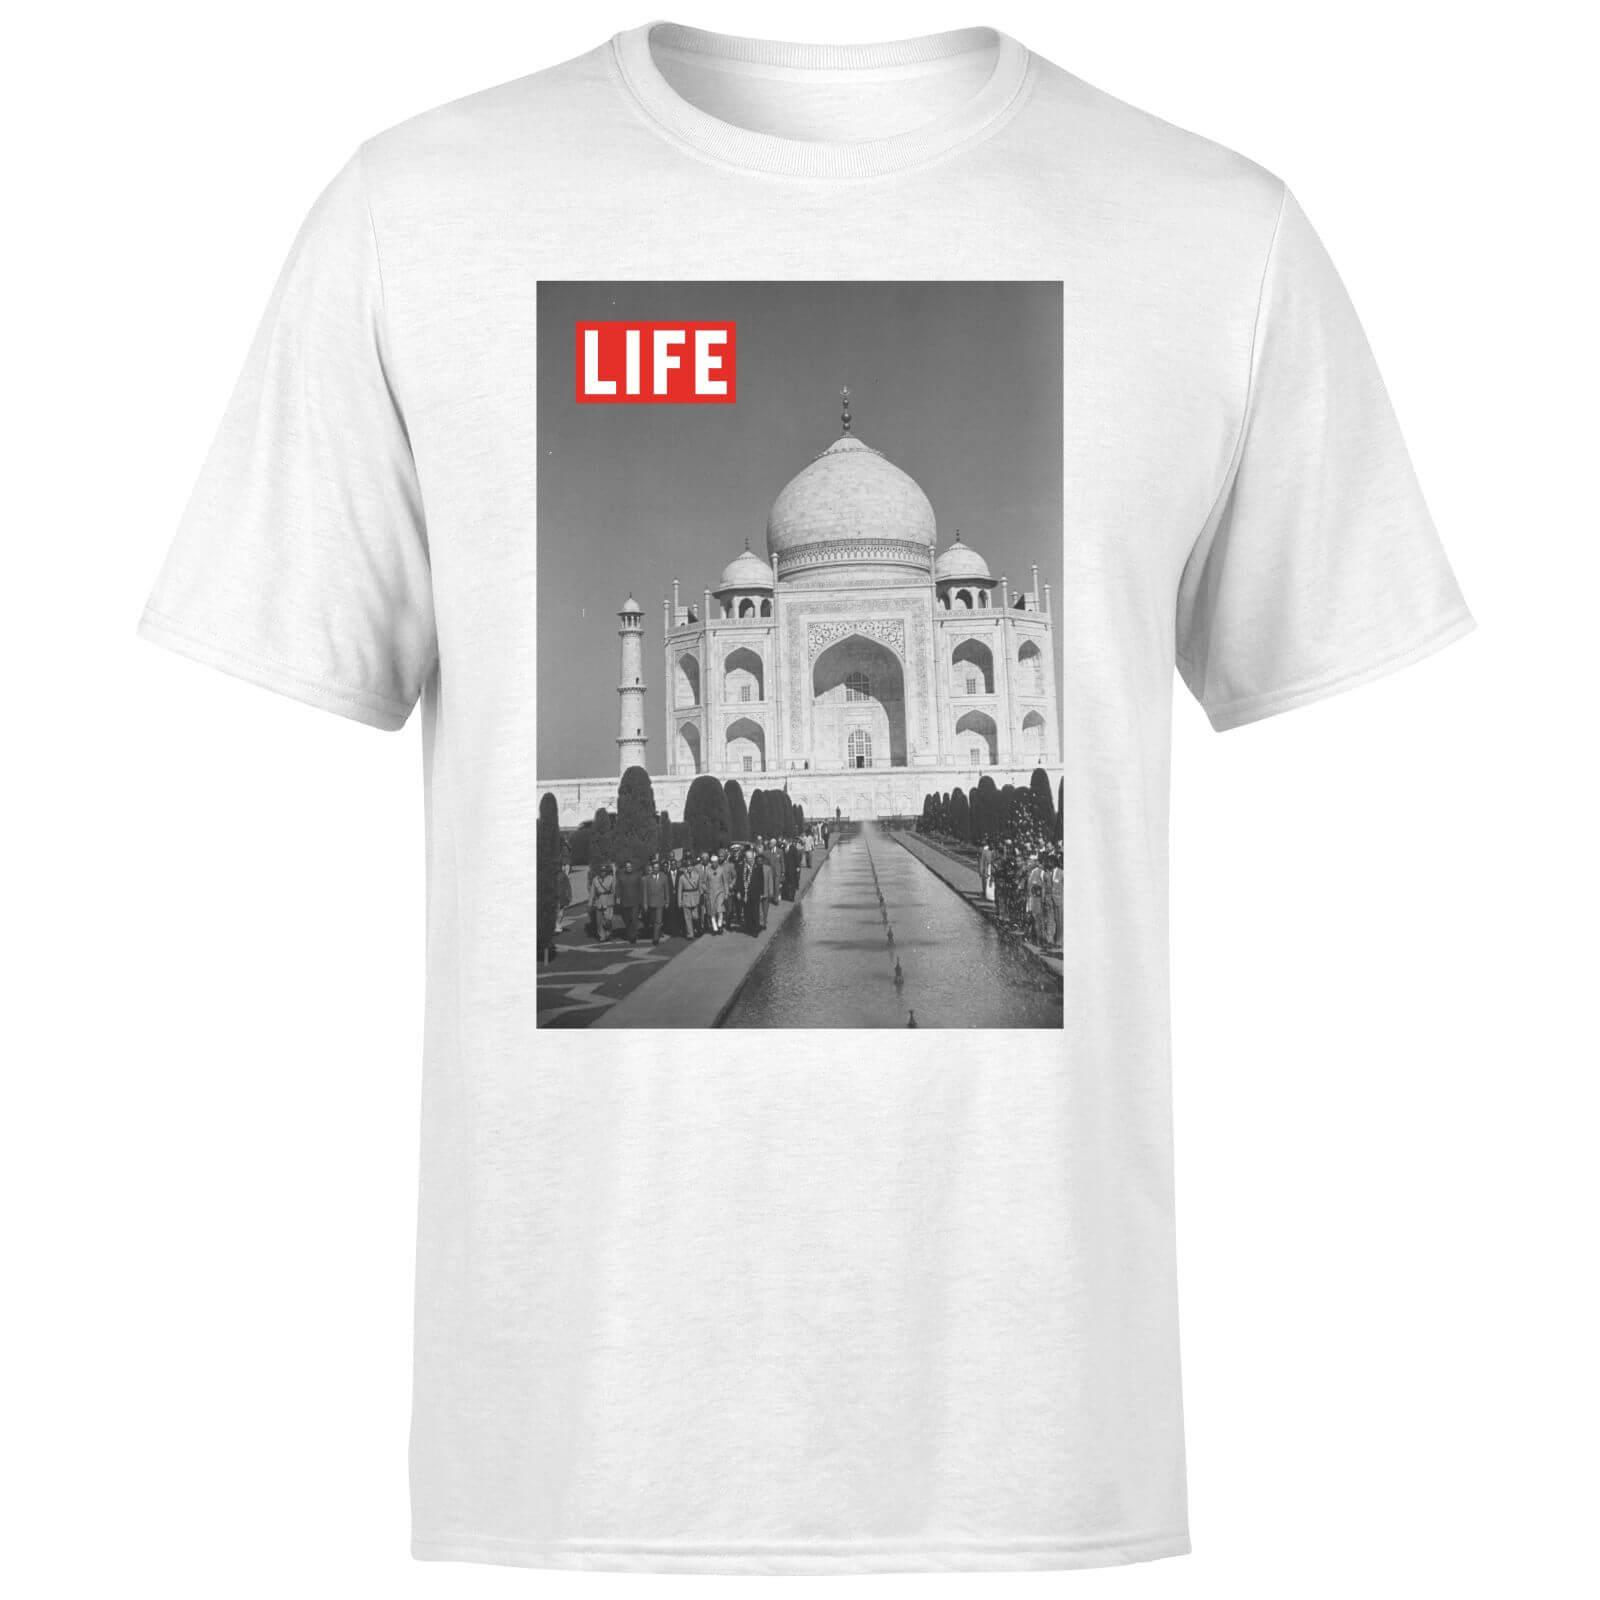 LIFE Magazine Taj Mahal Men's T-Shirt - White - M - White-male